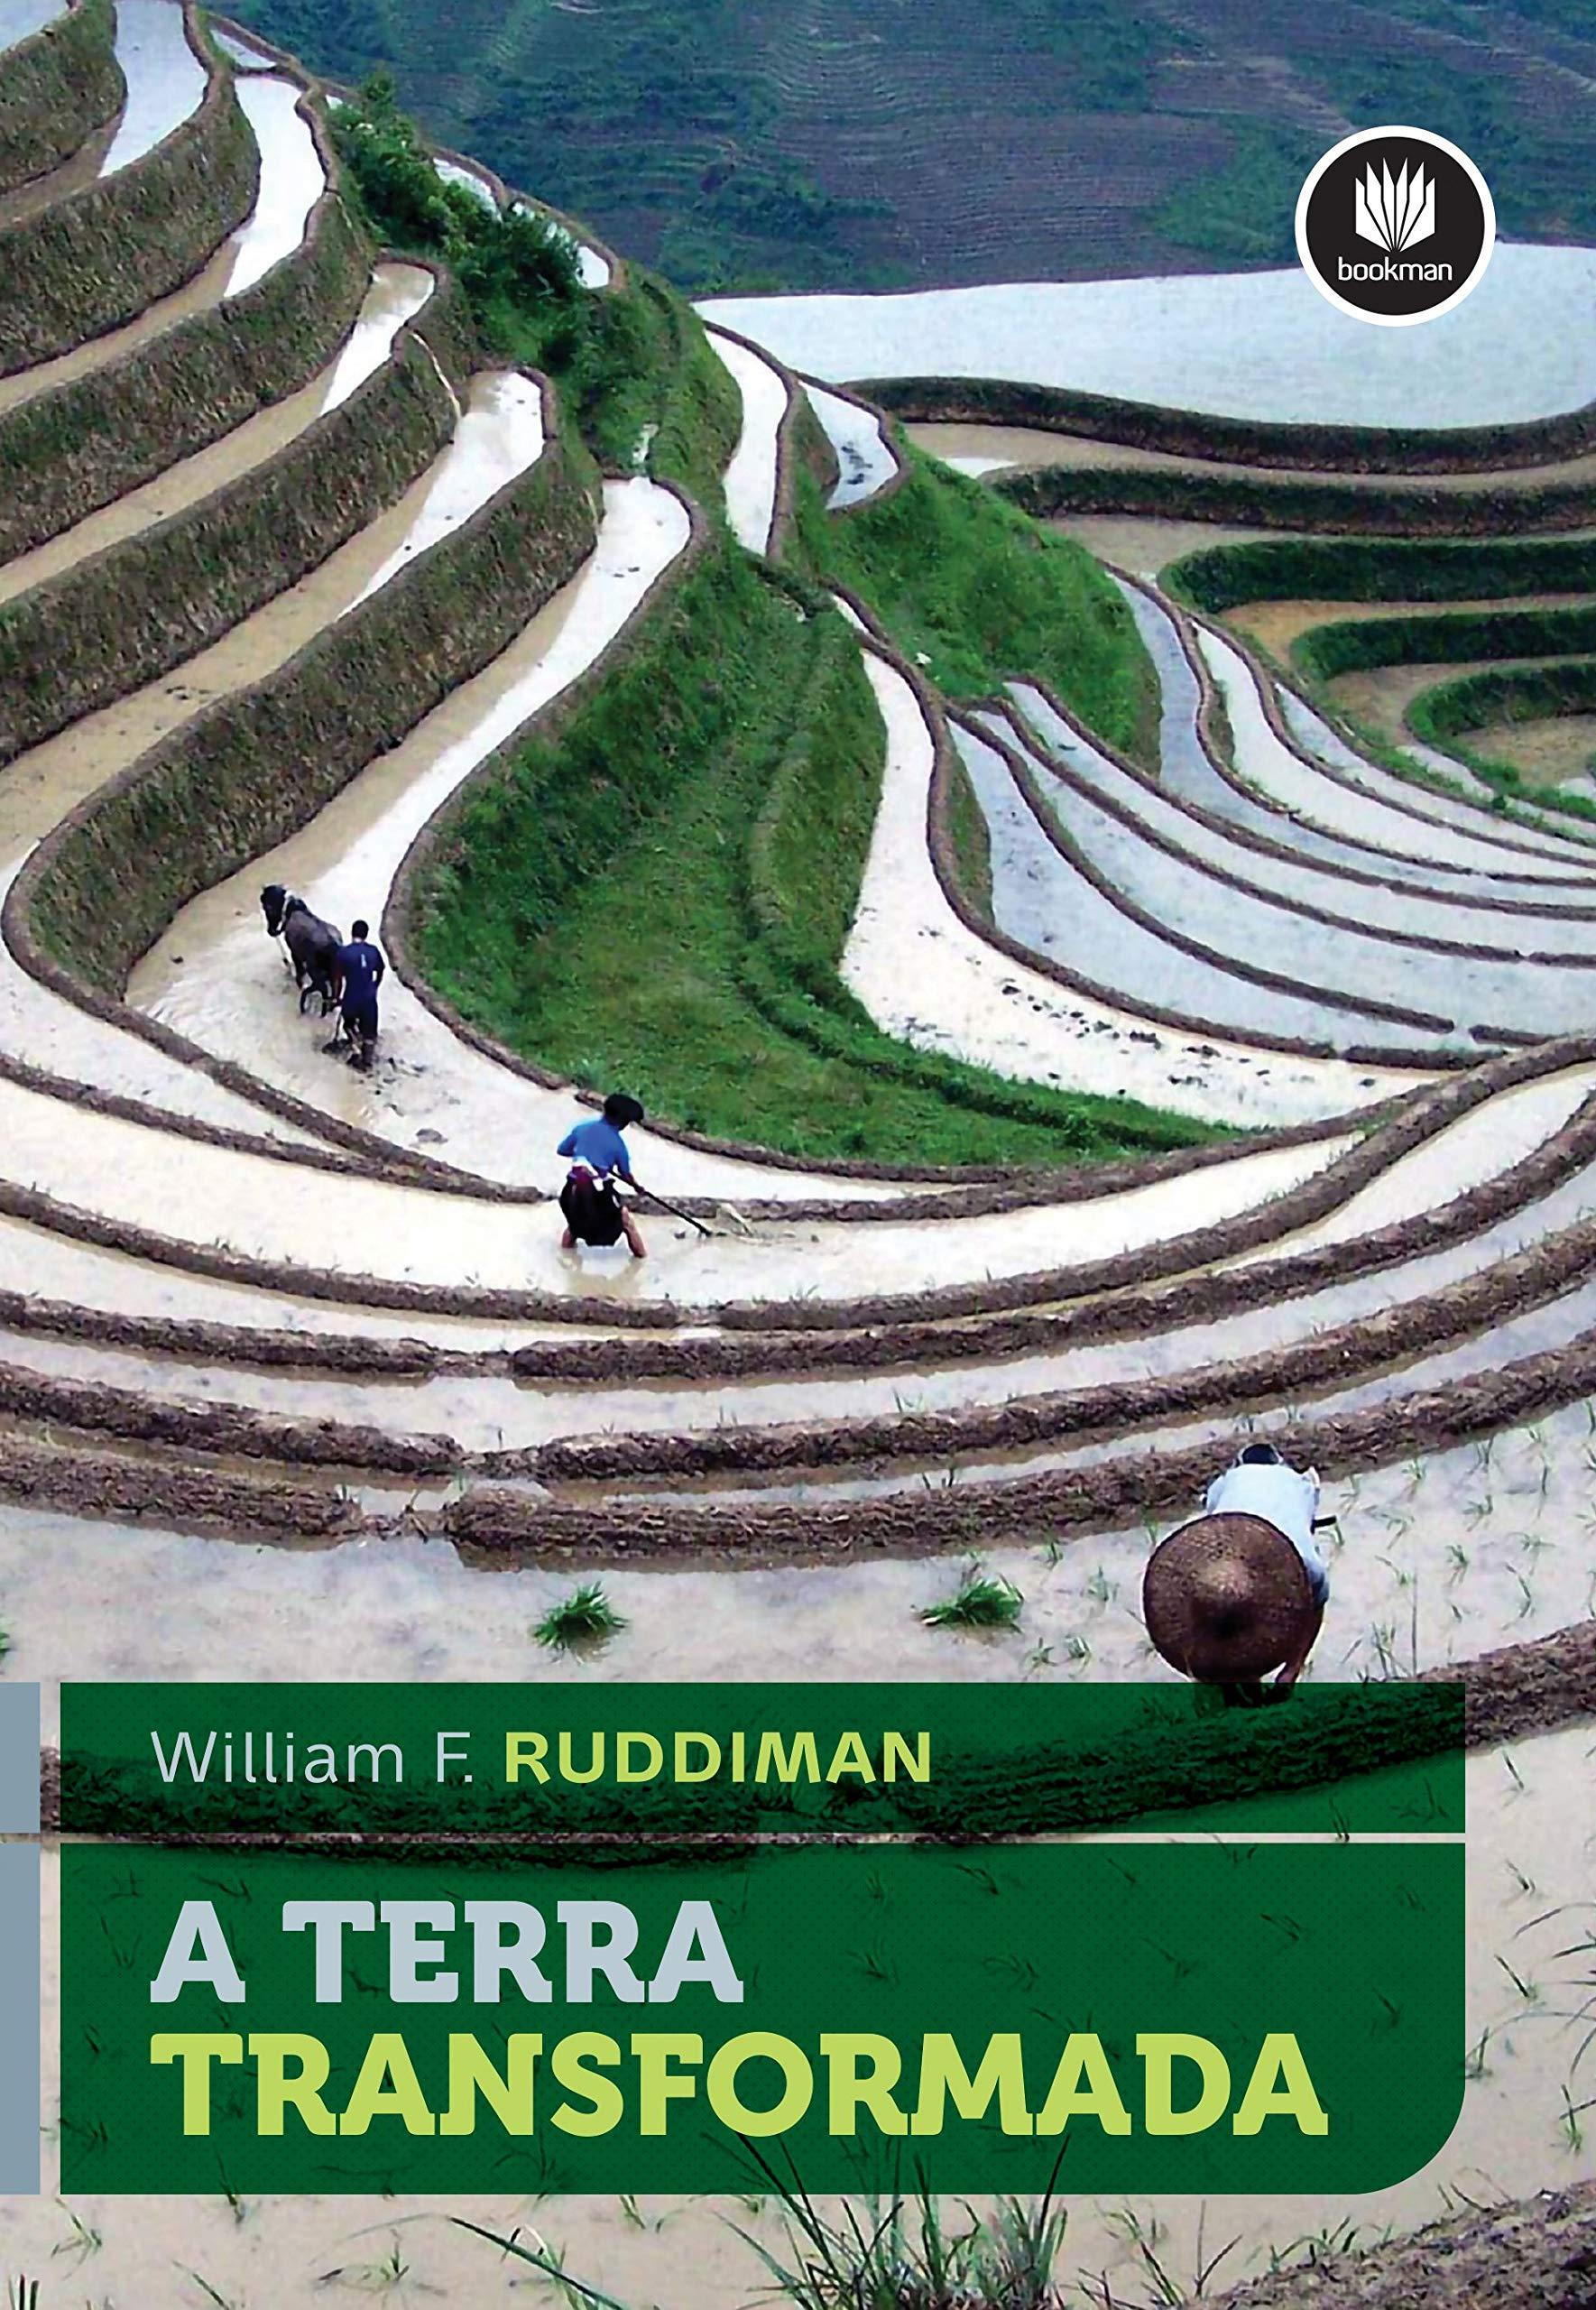 Terra Transformada, A: William F. Ruddiman: 9788582603550 ...